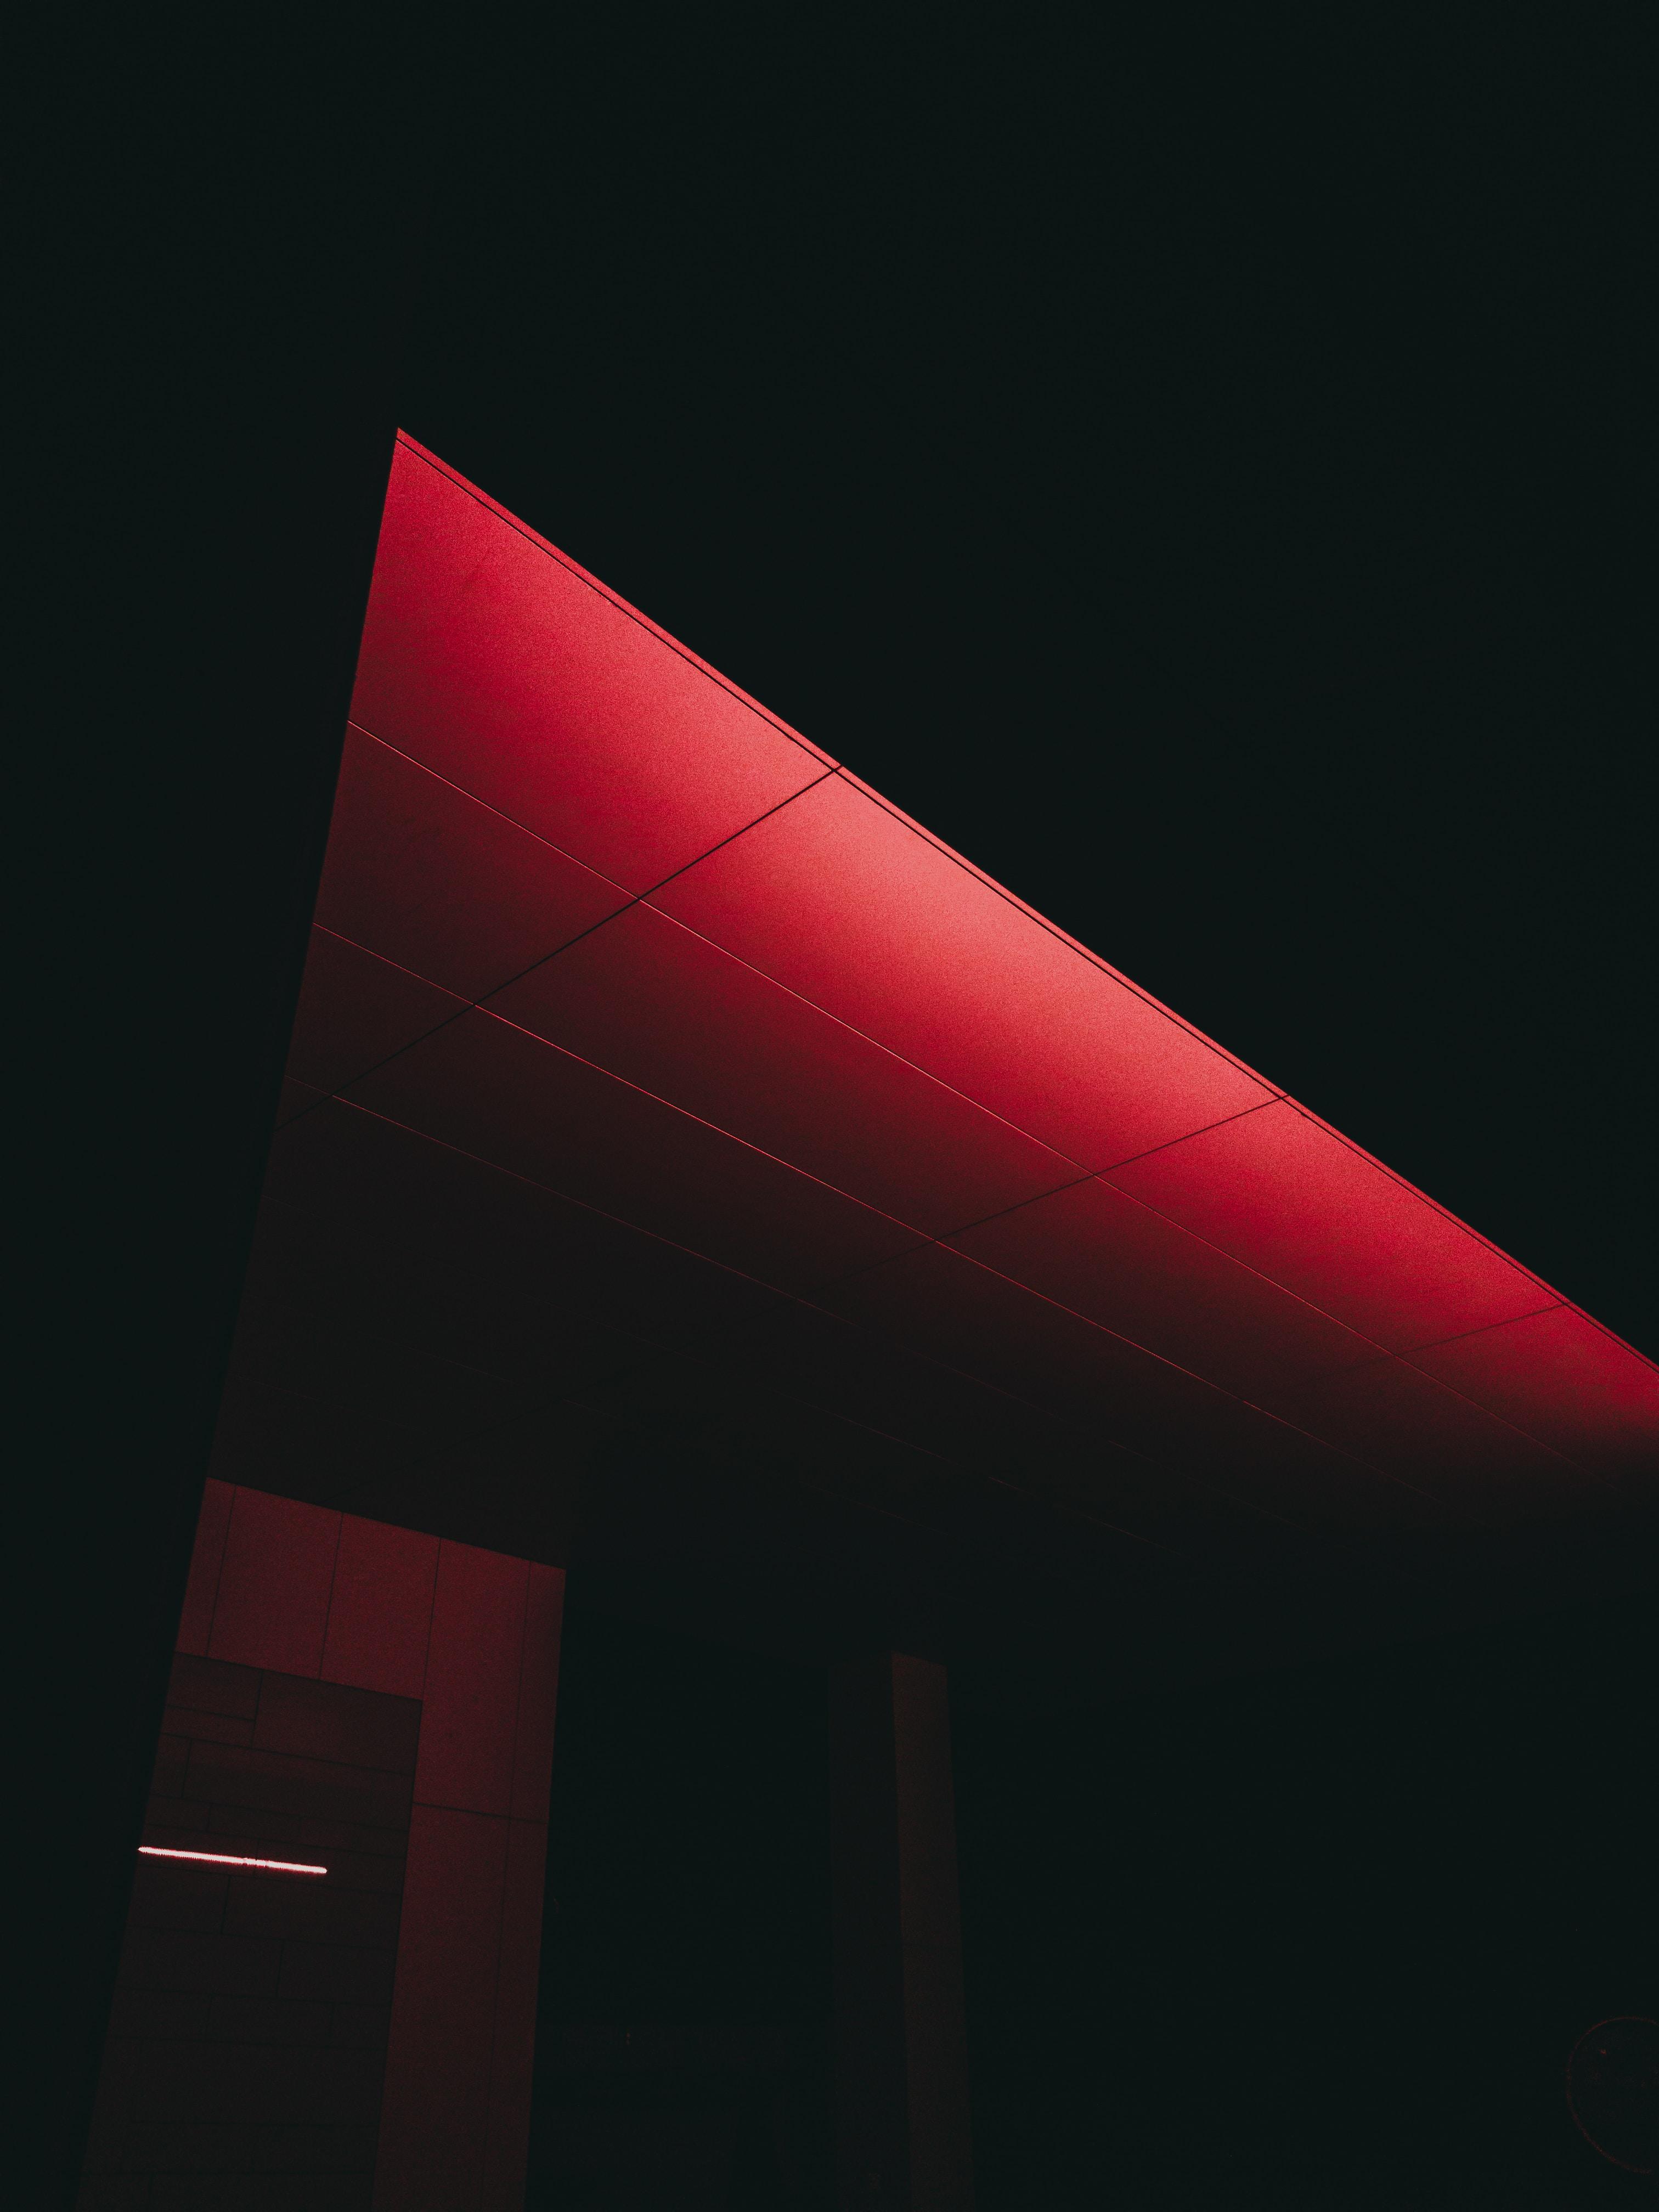 red lightened ceiling